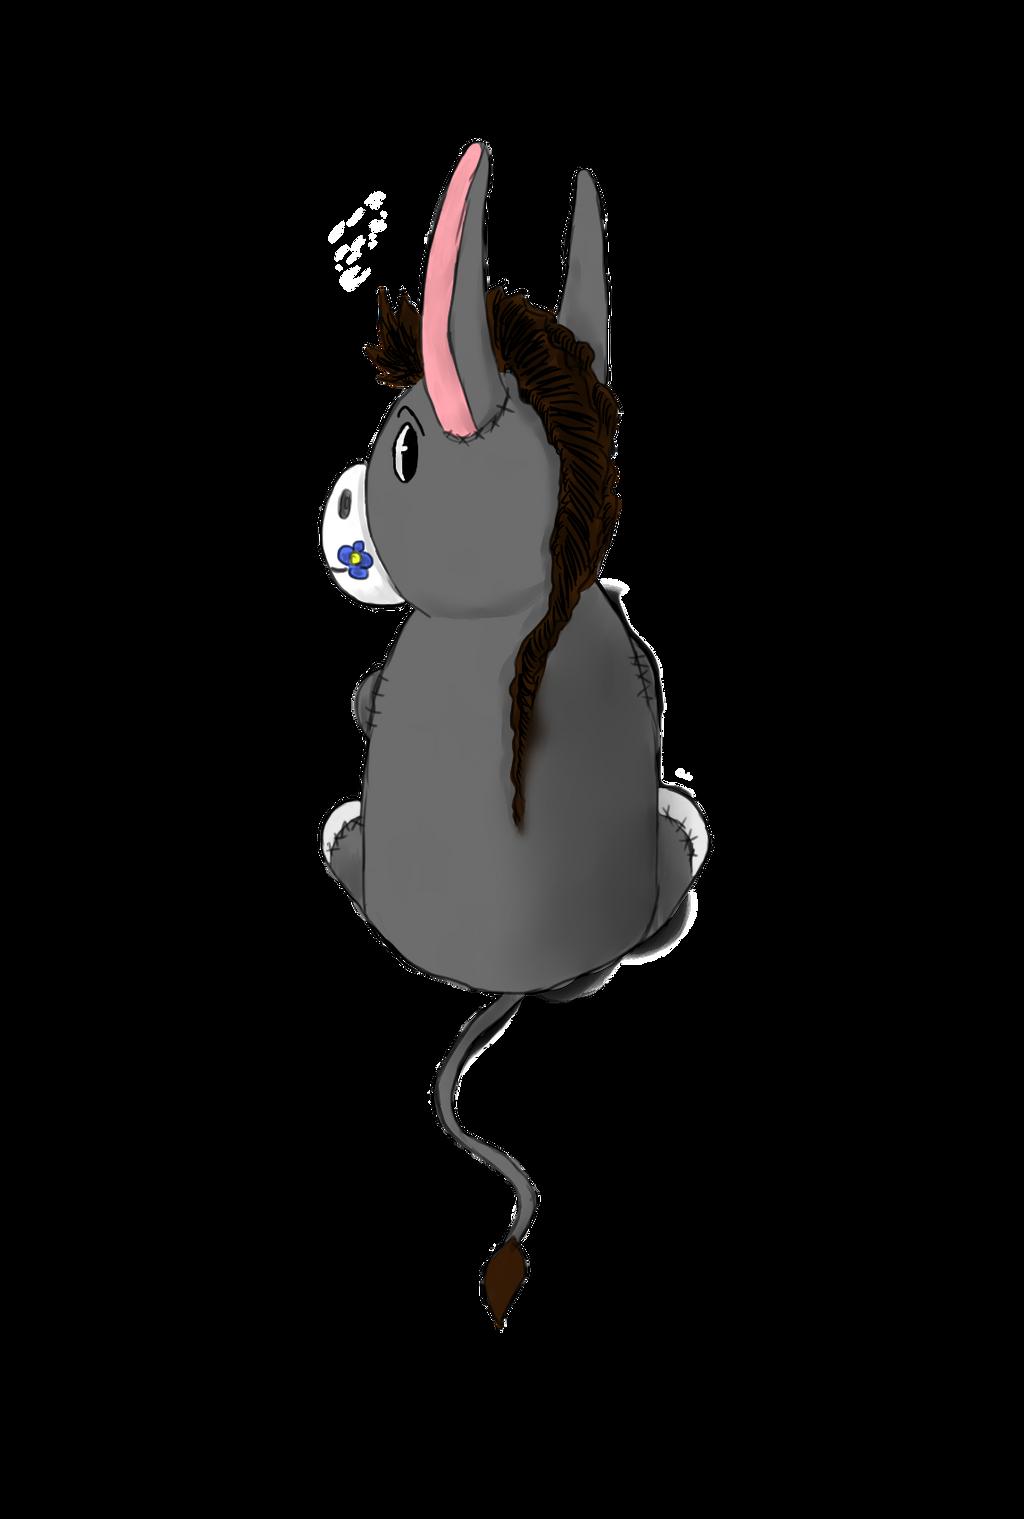 Donkey Schoen by edelneos